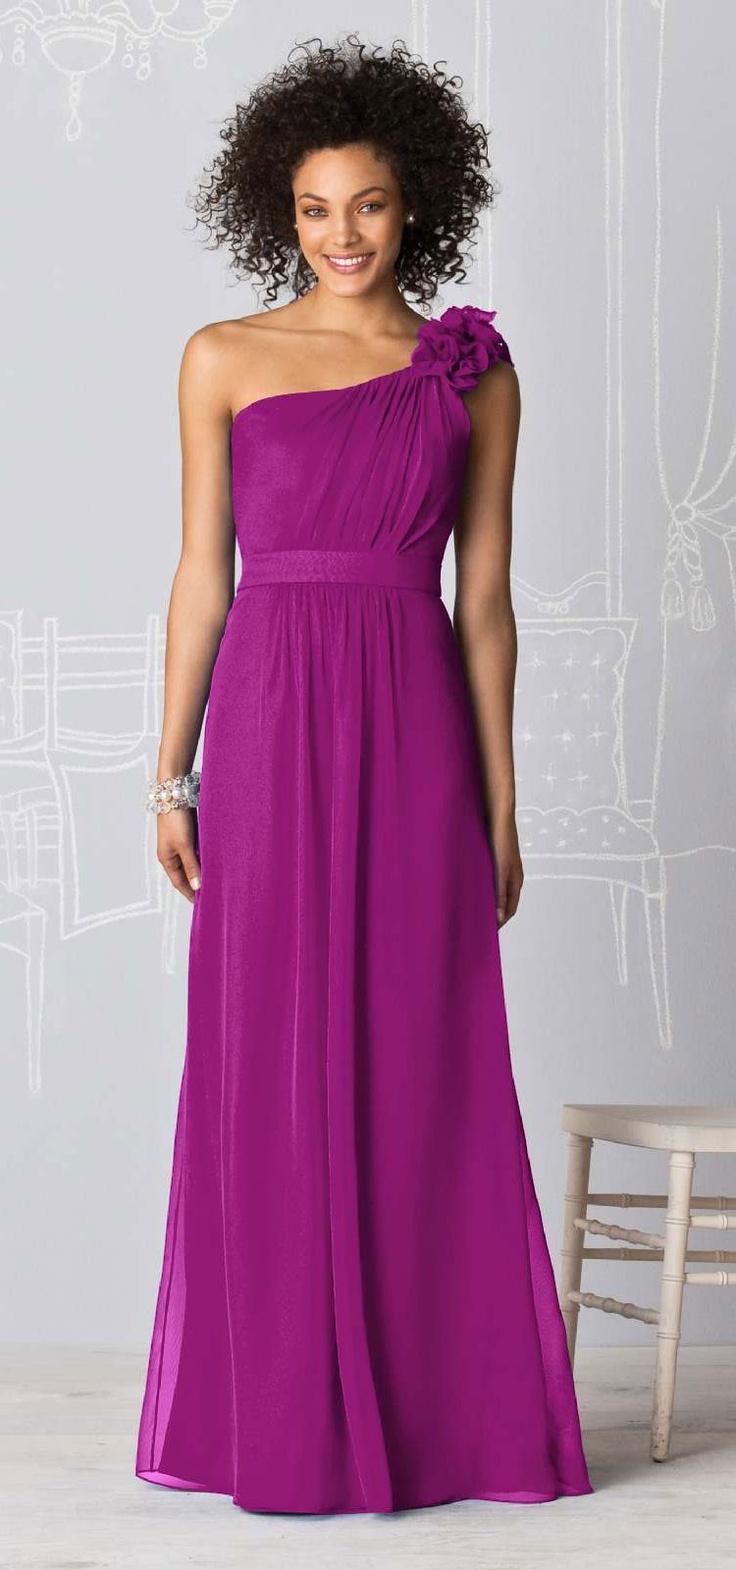 After Six Bridesmaid Dress, Floor Length, Magenta, $230 via Weddington Way, Persian Plum 1140